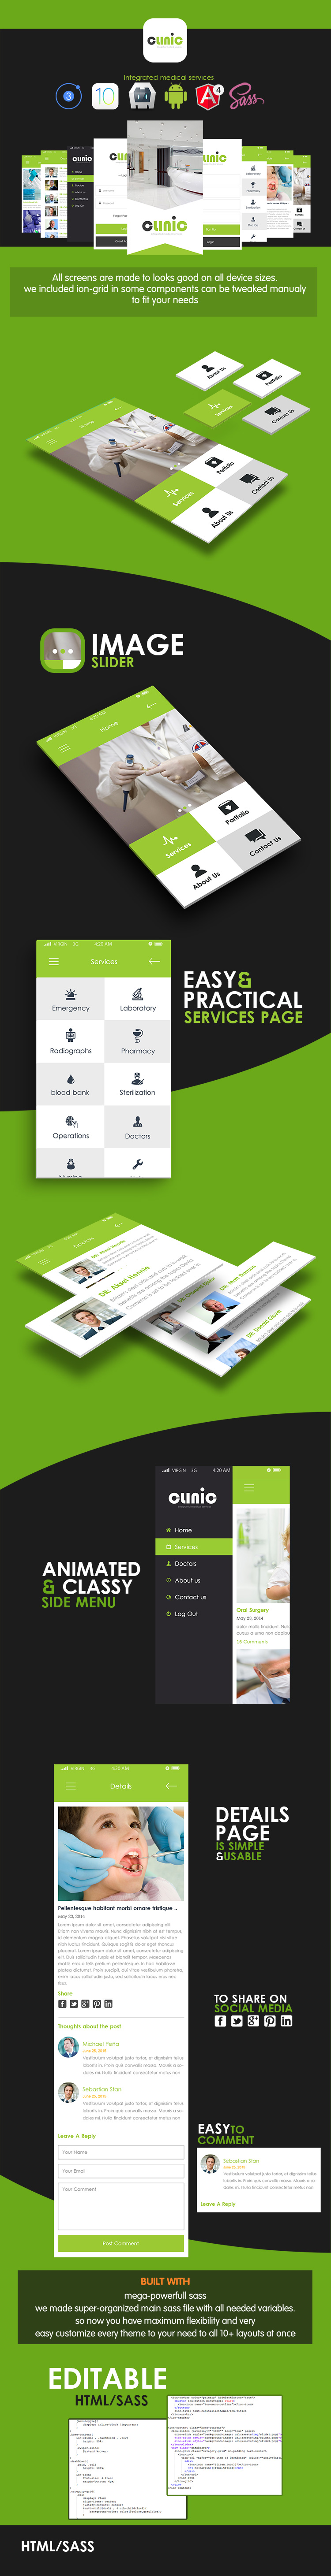 Clinc v2-ionic app theme